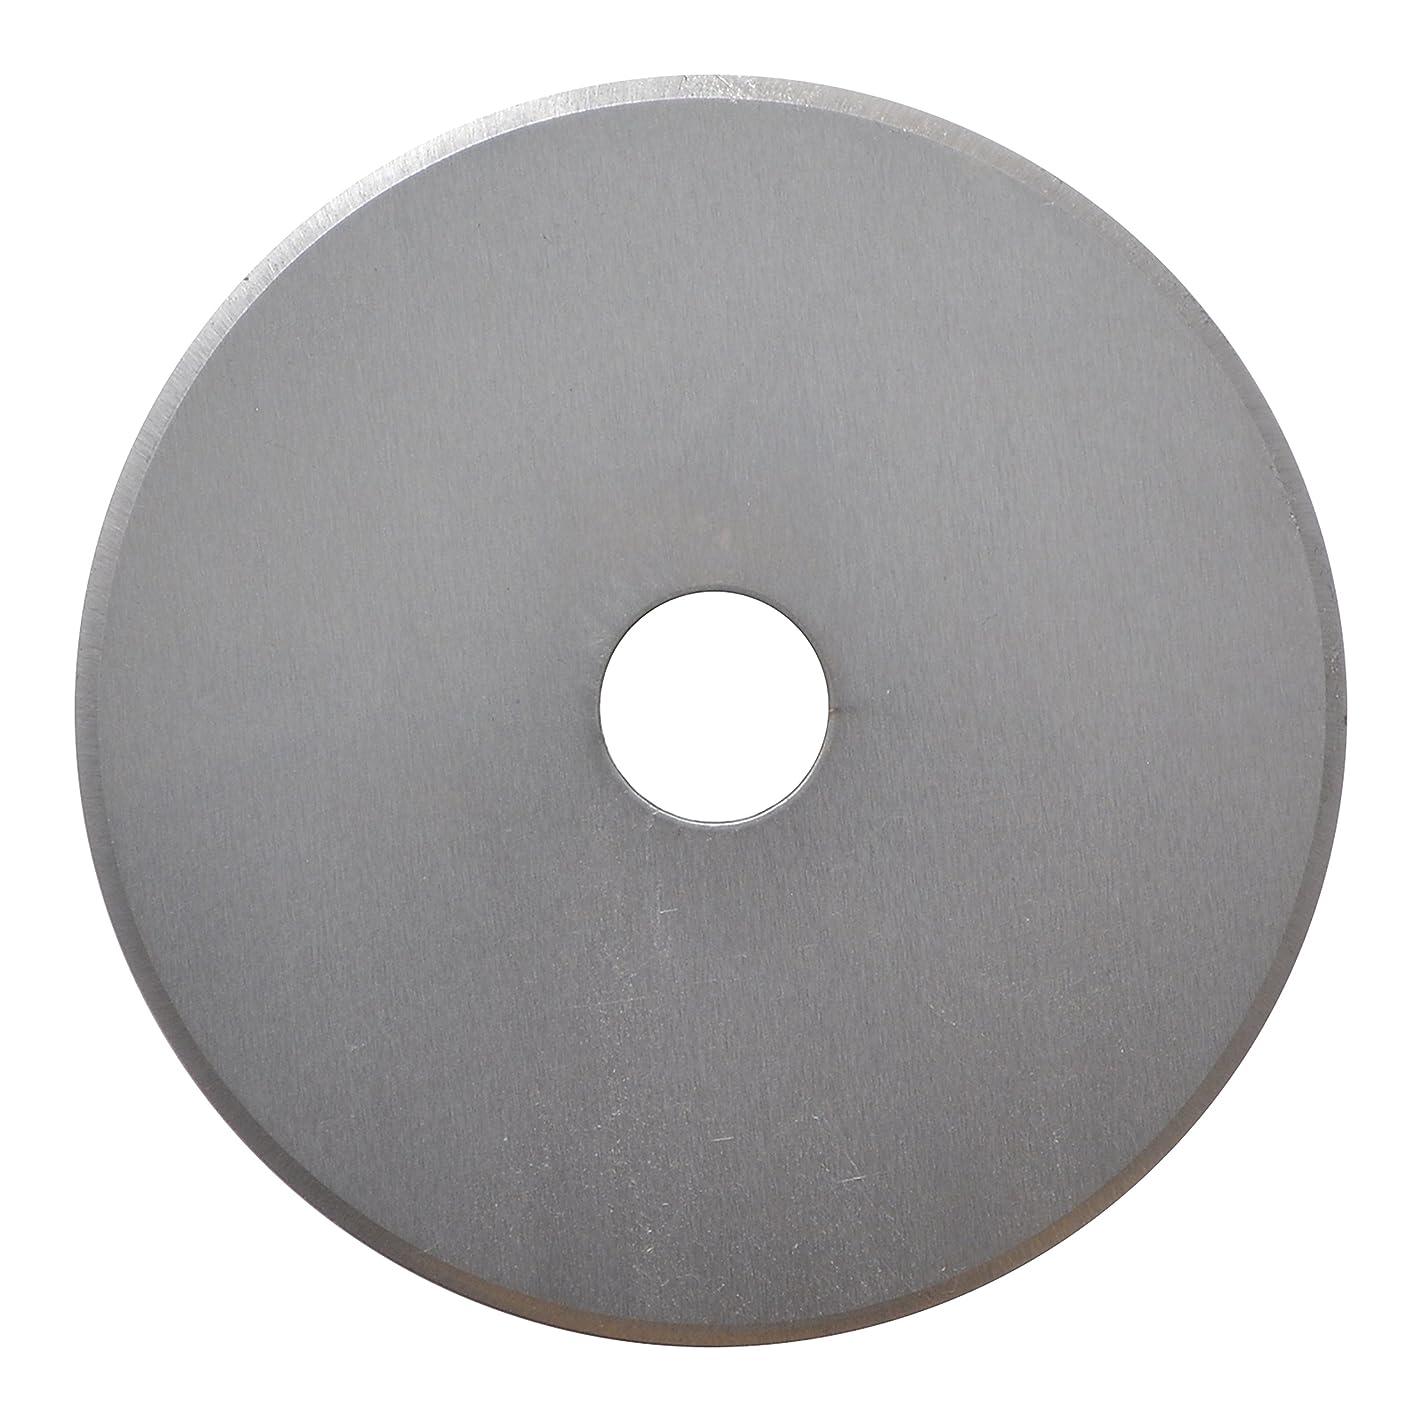 Westcott Titanium Bonded Rotary Replacement Blade, 45mm (16371)